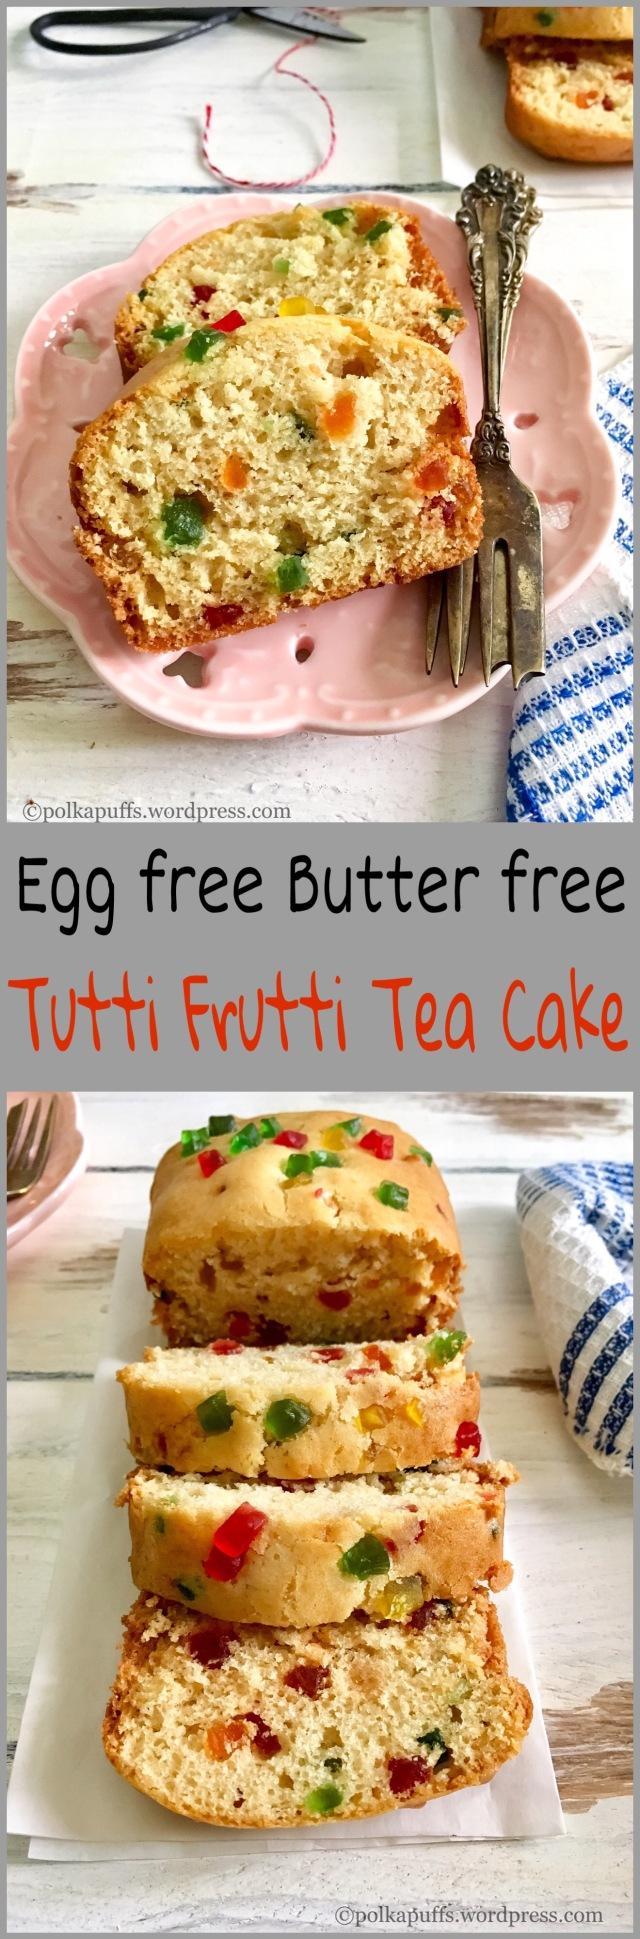 Egg free Tutti Frutti Cake